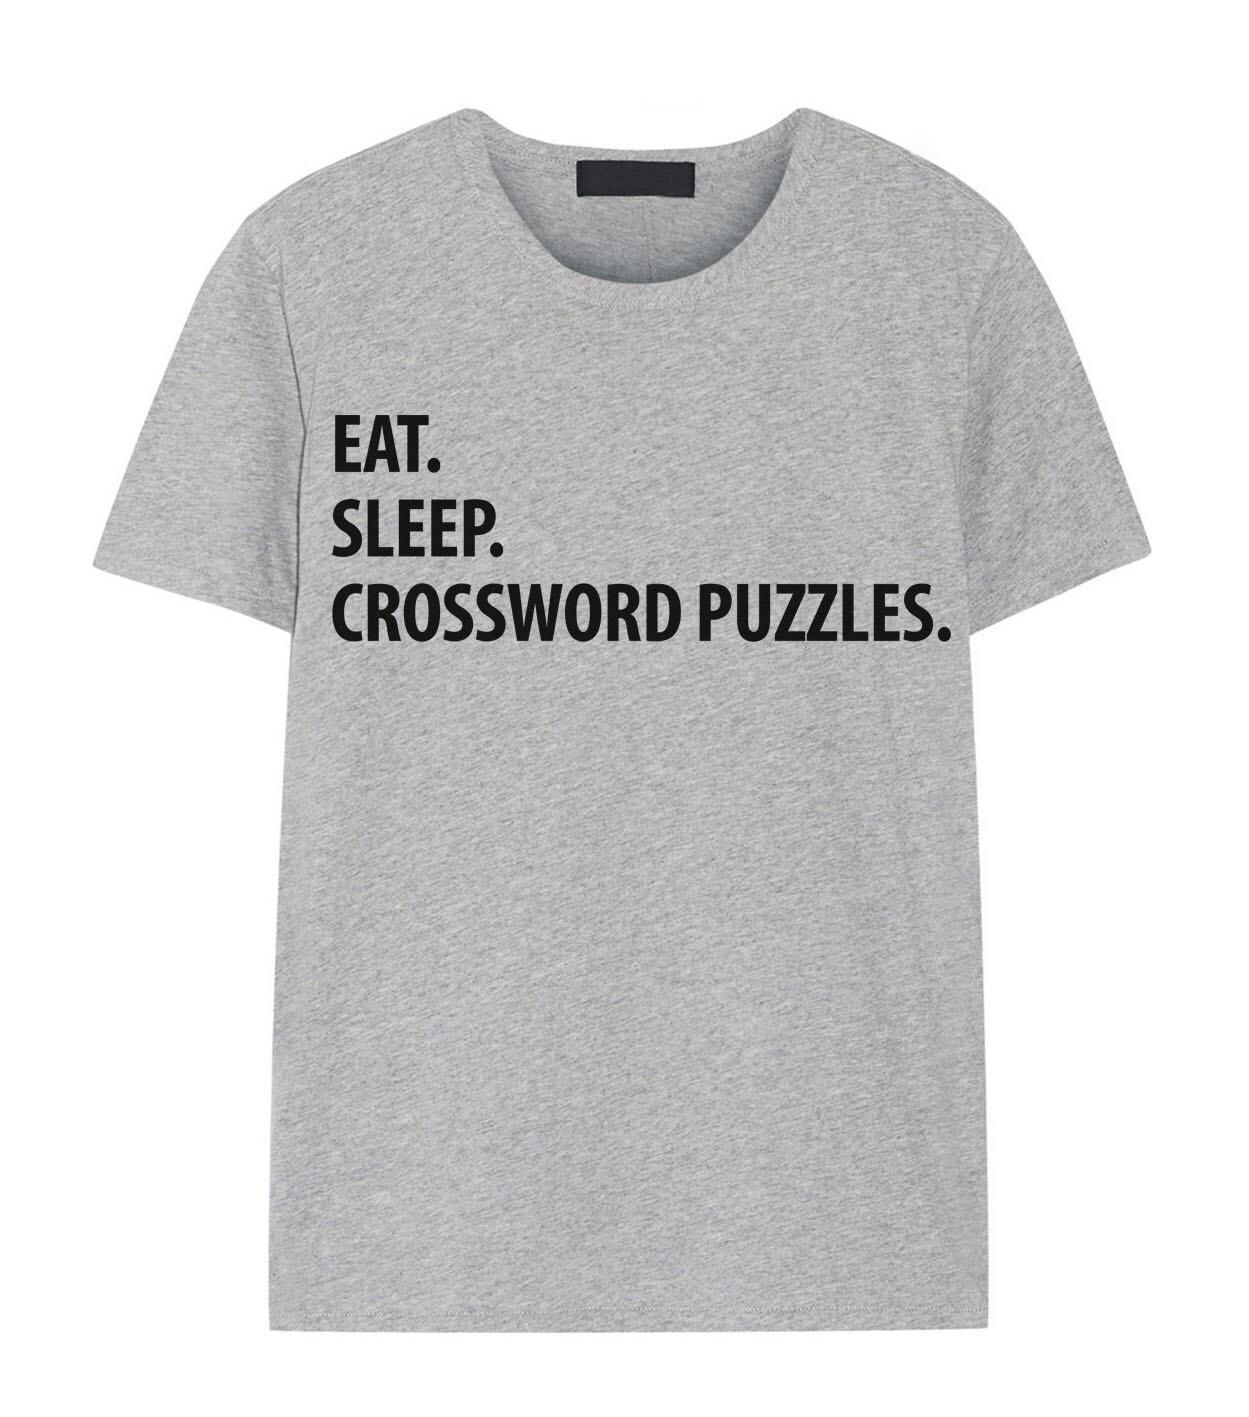 e97ac3e10 Crossword Puzzle T-Shirt Eat Sleep Crossword Puzzle shirt   Etsy